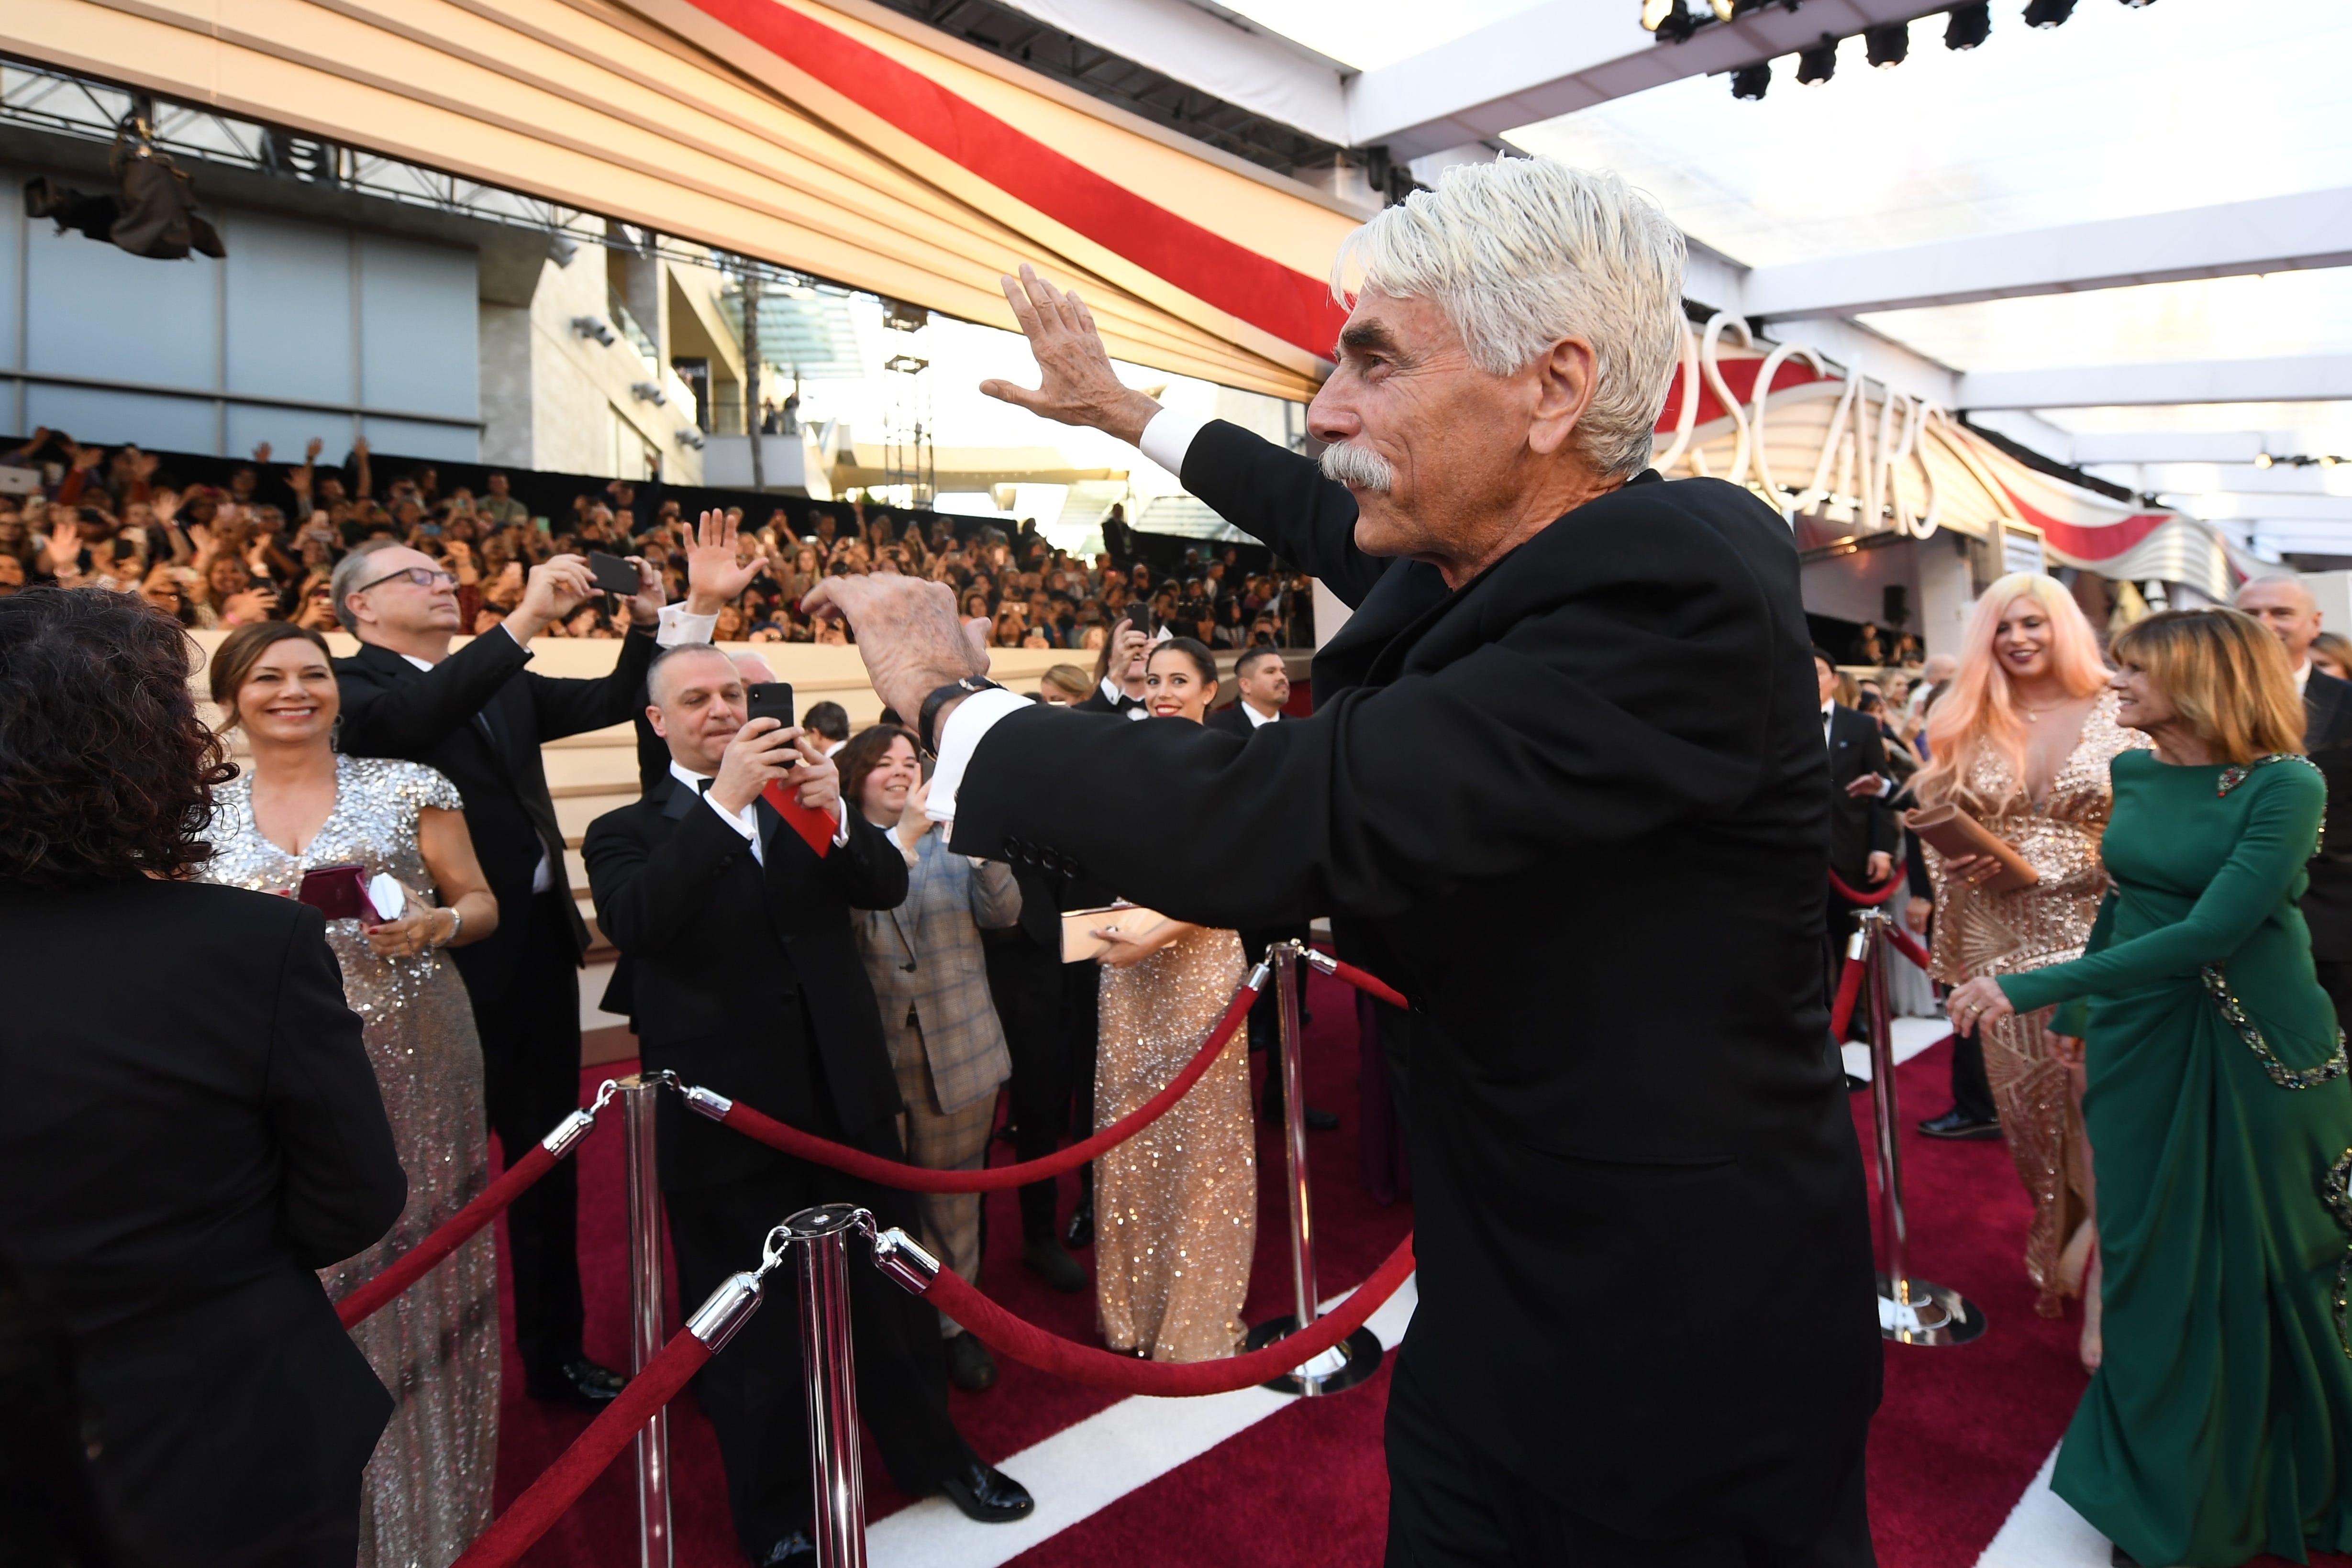 February 24, 2019; Los Angeles, CA, USA; Sam Elliott arrives at the 91st Academy Awards at the Dolby Theatre. Mandatory Credit: Robert Hanashiro-USA TODAY NETWORK (Via OlyDrop)